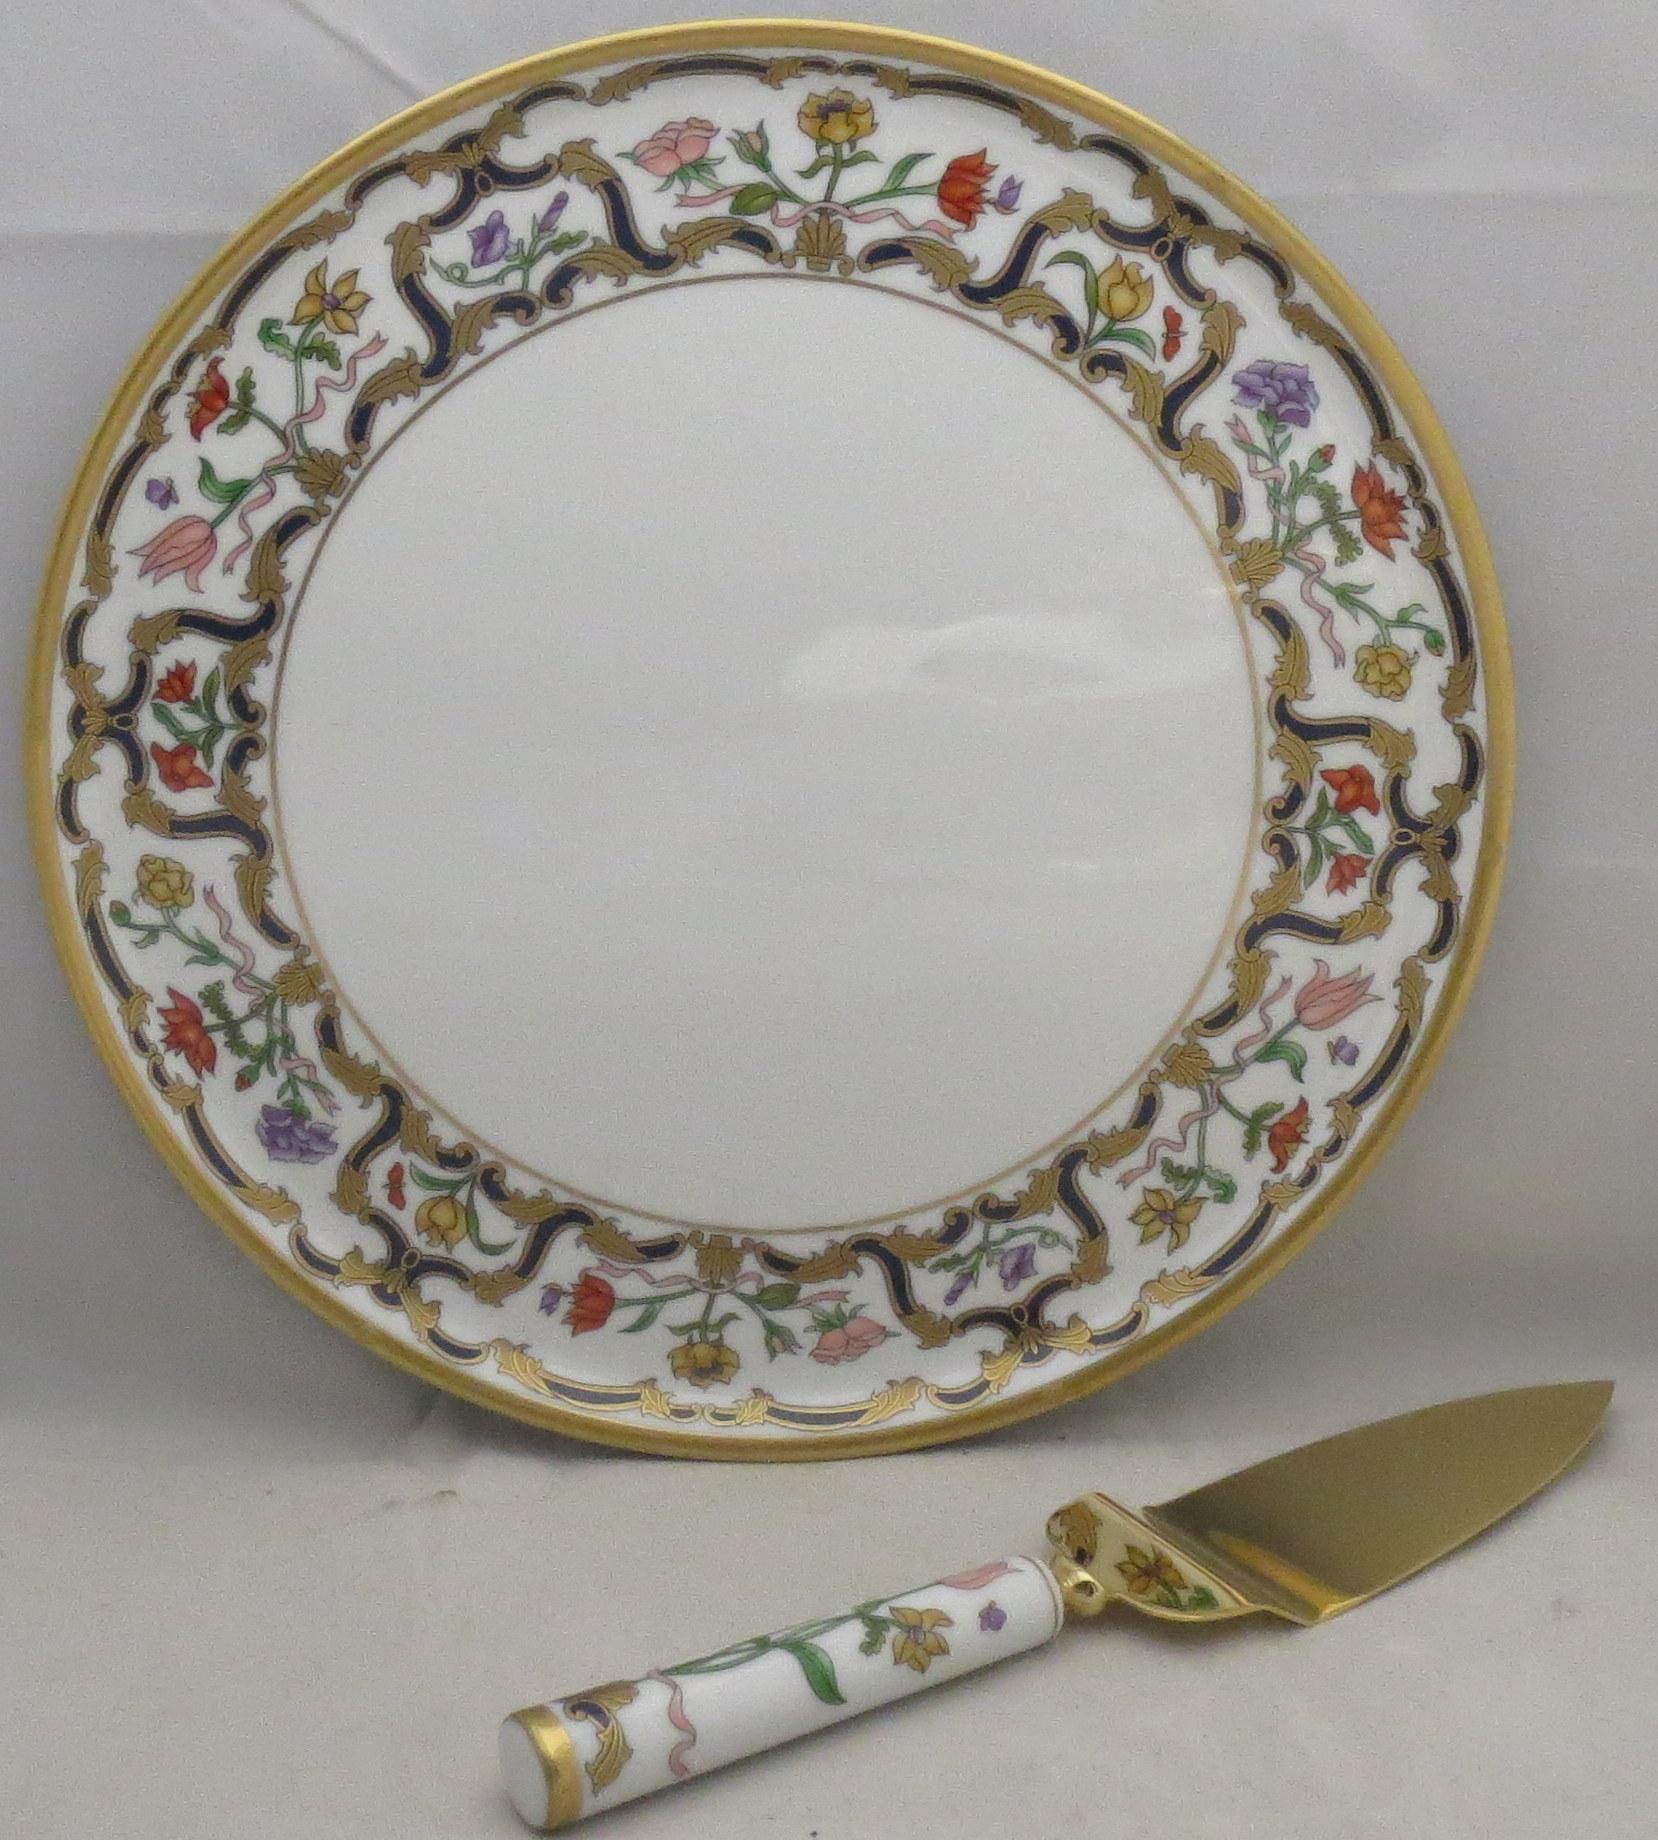 sc 1 st  Classic Replacements & Christian Dior Renaissance Cake Plate